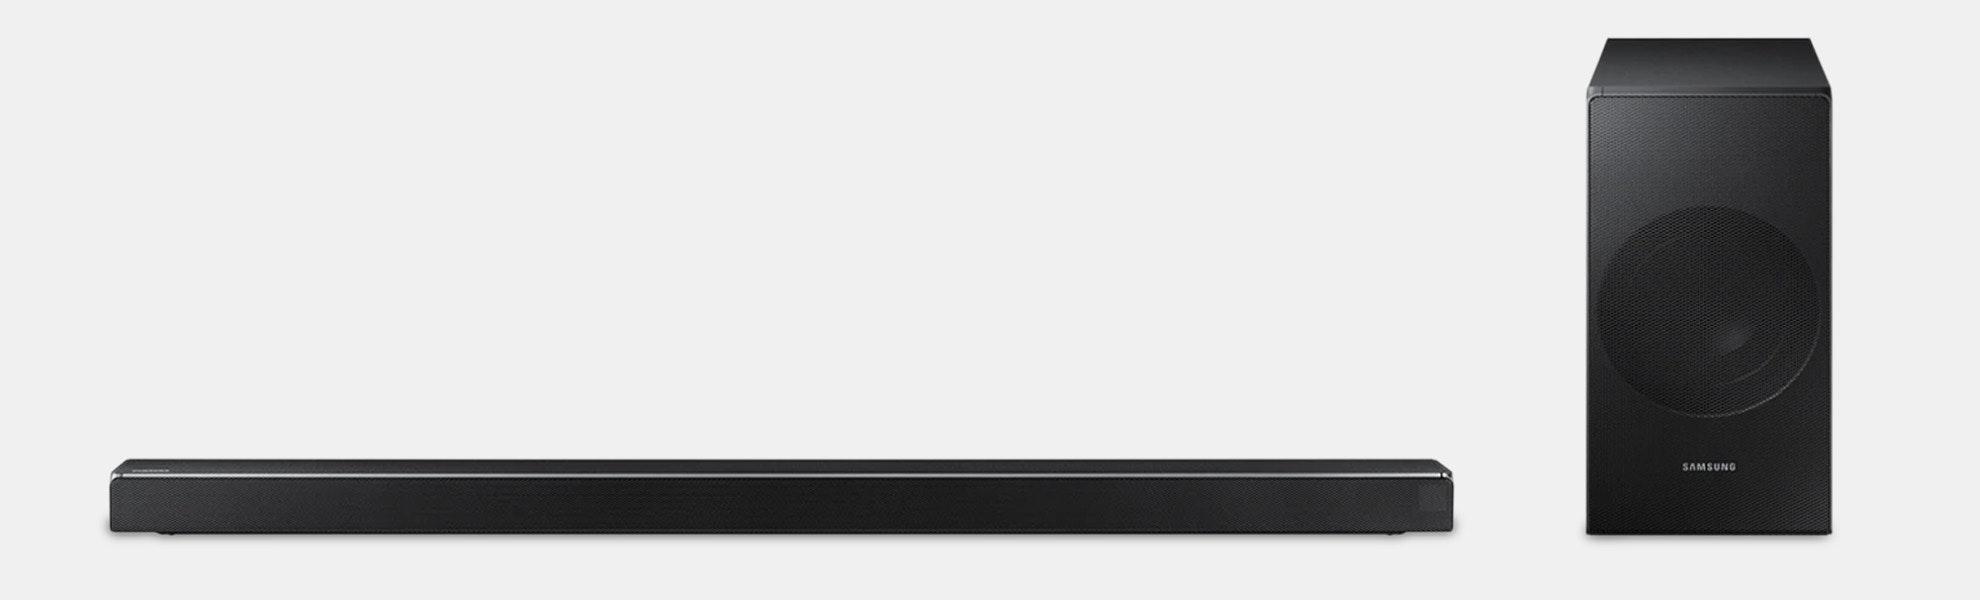 Samsung HW-N650 5.1-Ch Panoramic Soundbar